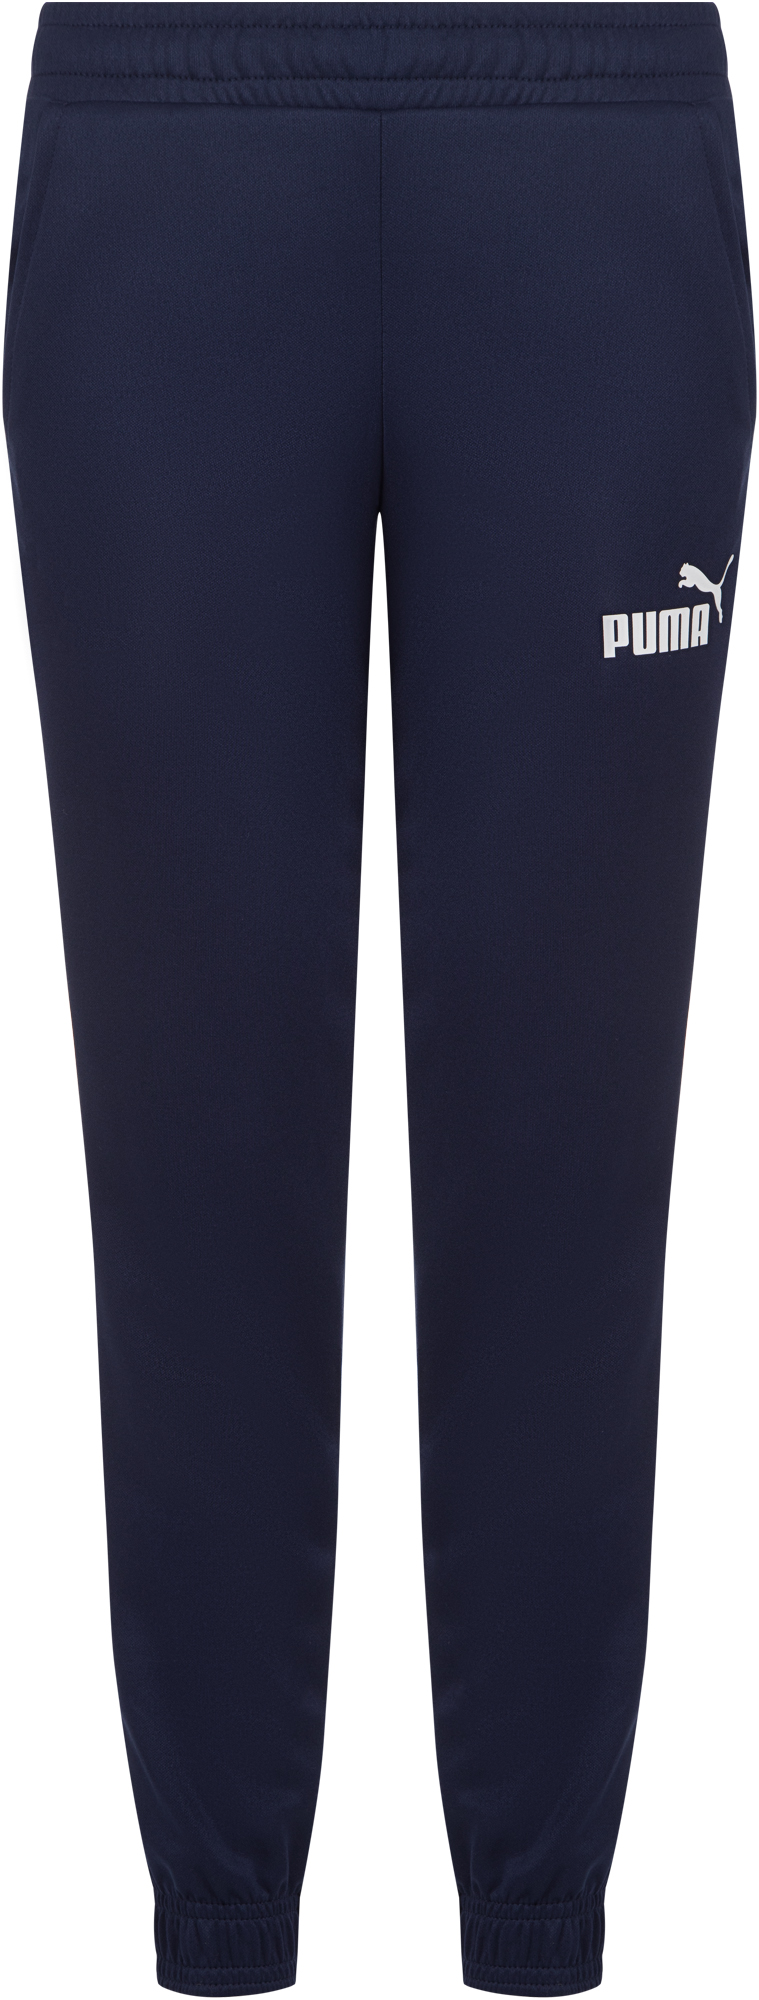 Puma Брюки для мальчиков Puma ESS Logo Poly, размер 164